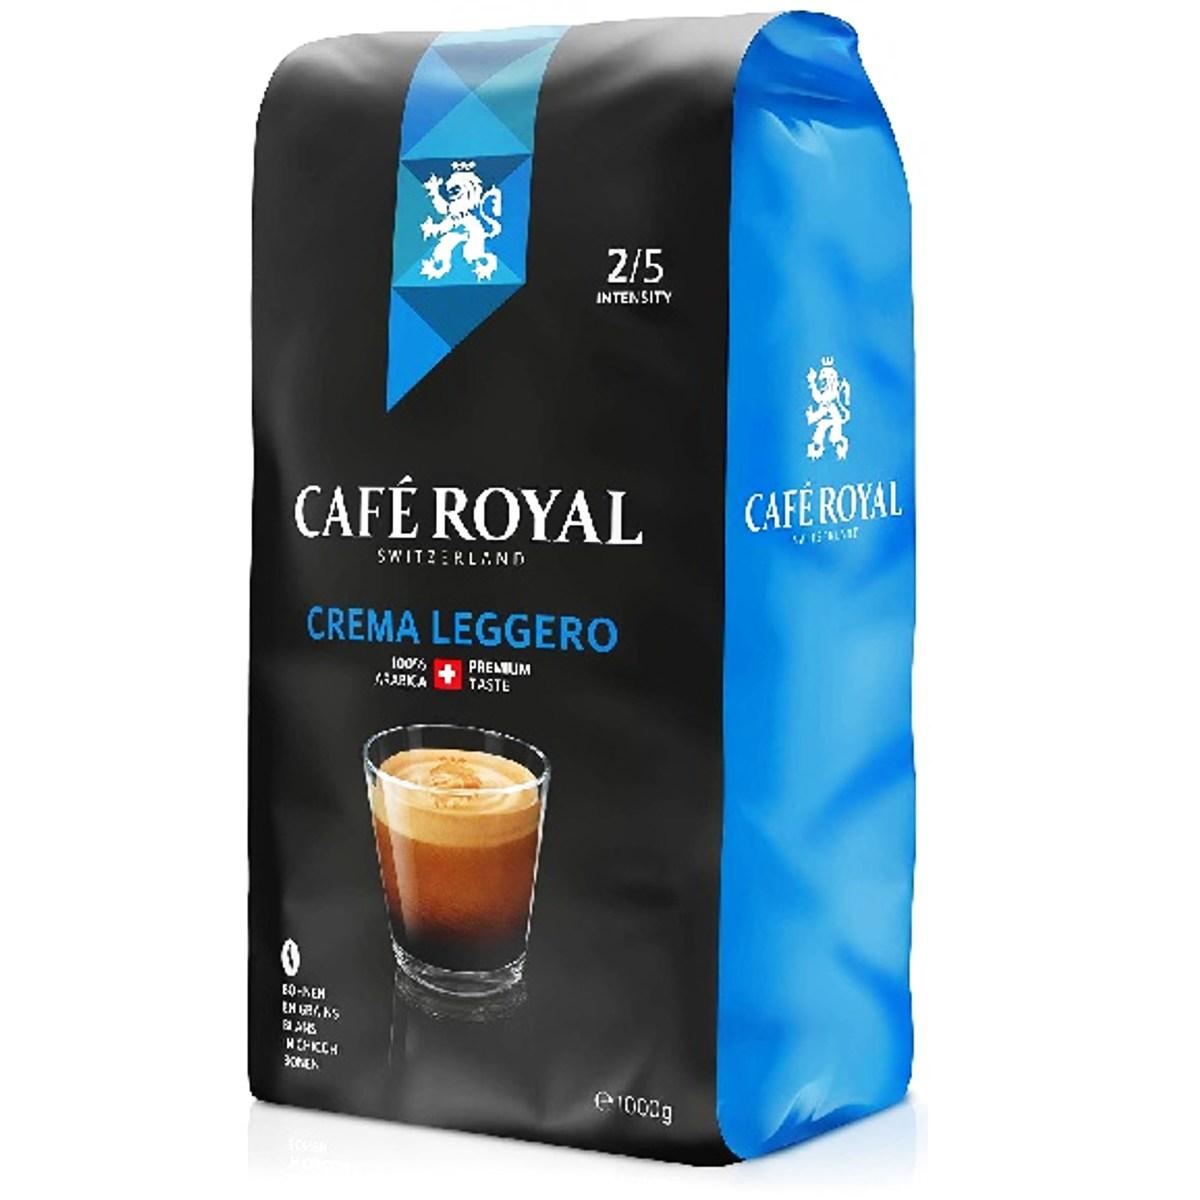 Cafe Royal Crema Leggero cafea la boabe 500gr.